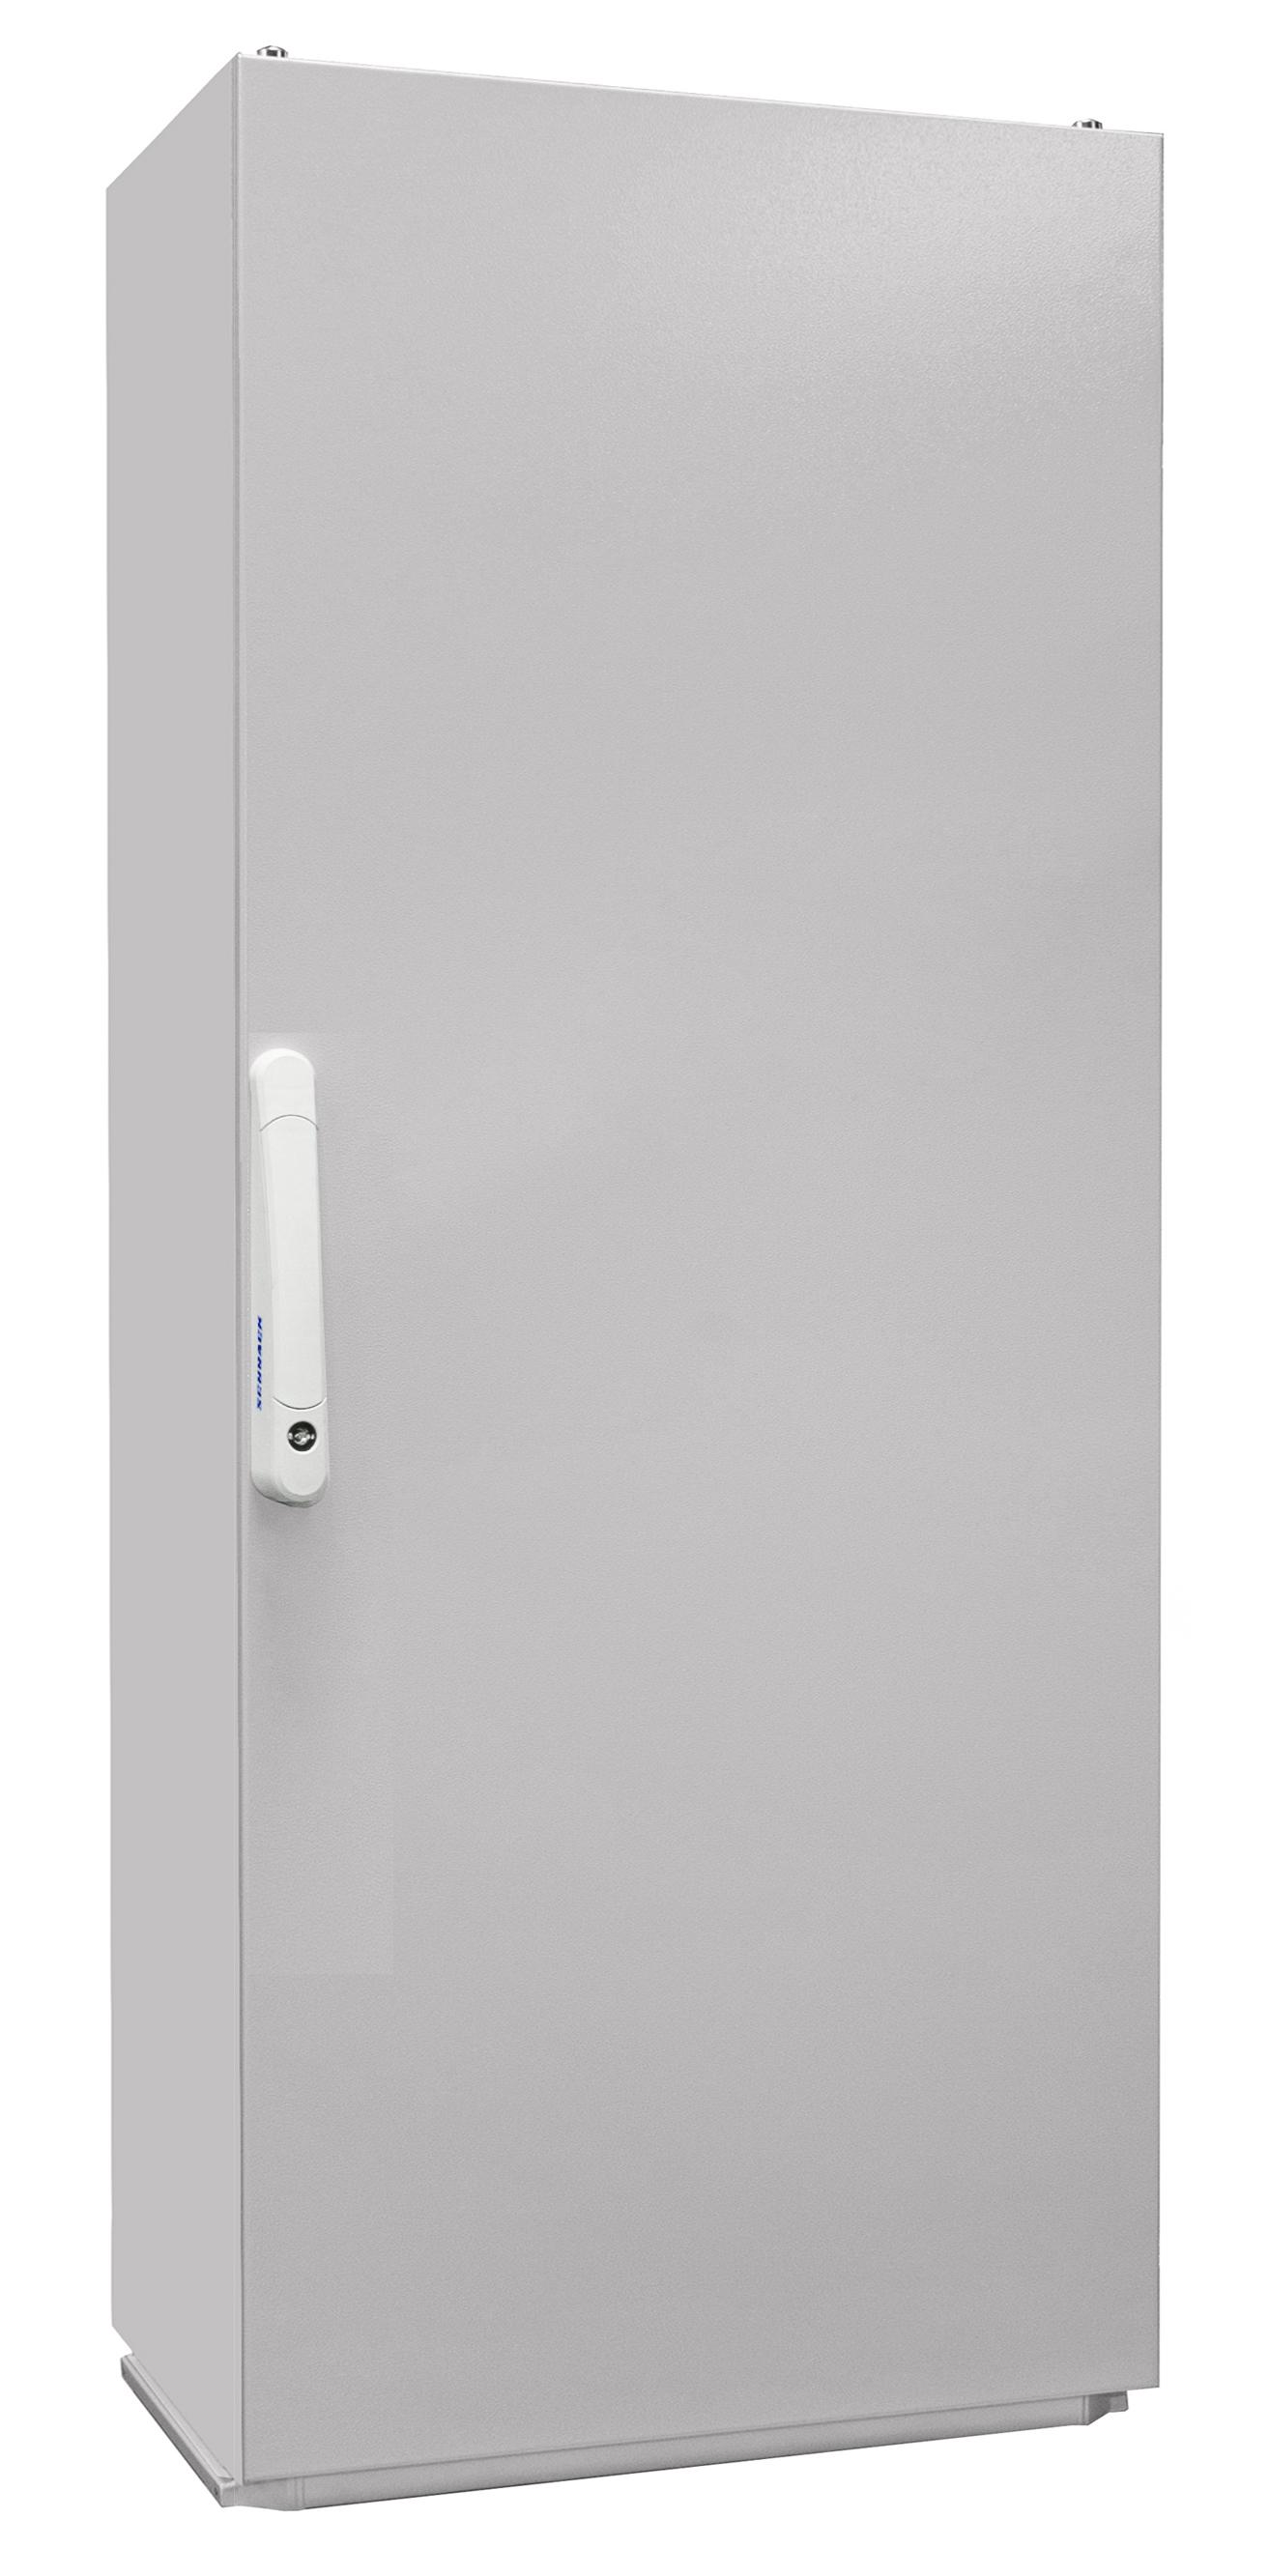 1 Stk Kompaktschrank 1-Tür IP55 H=1400 B=600 T=300mm Stahlblech KC146030--